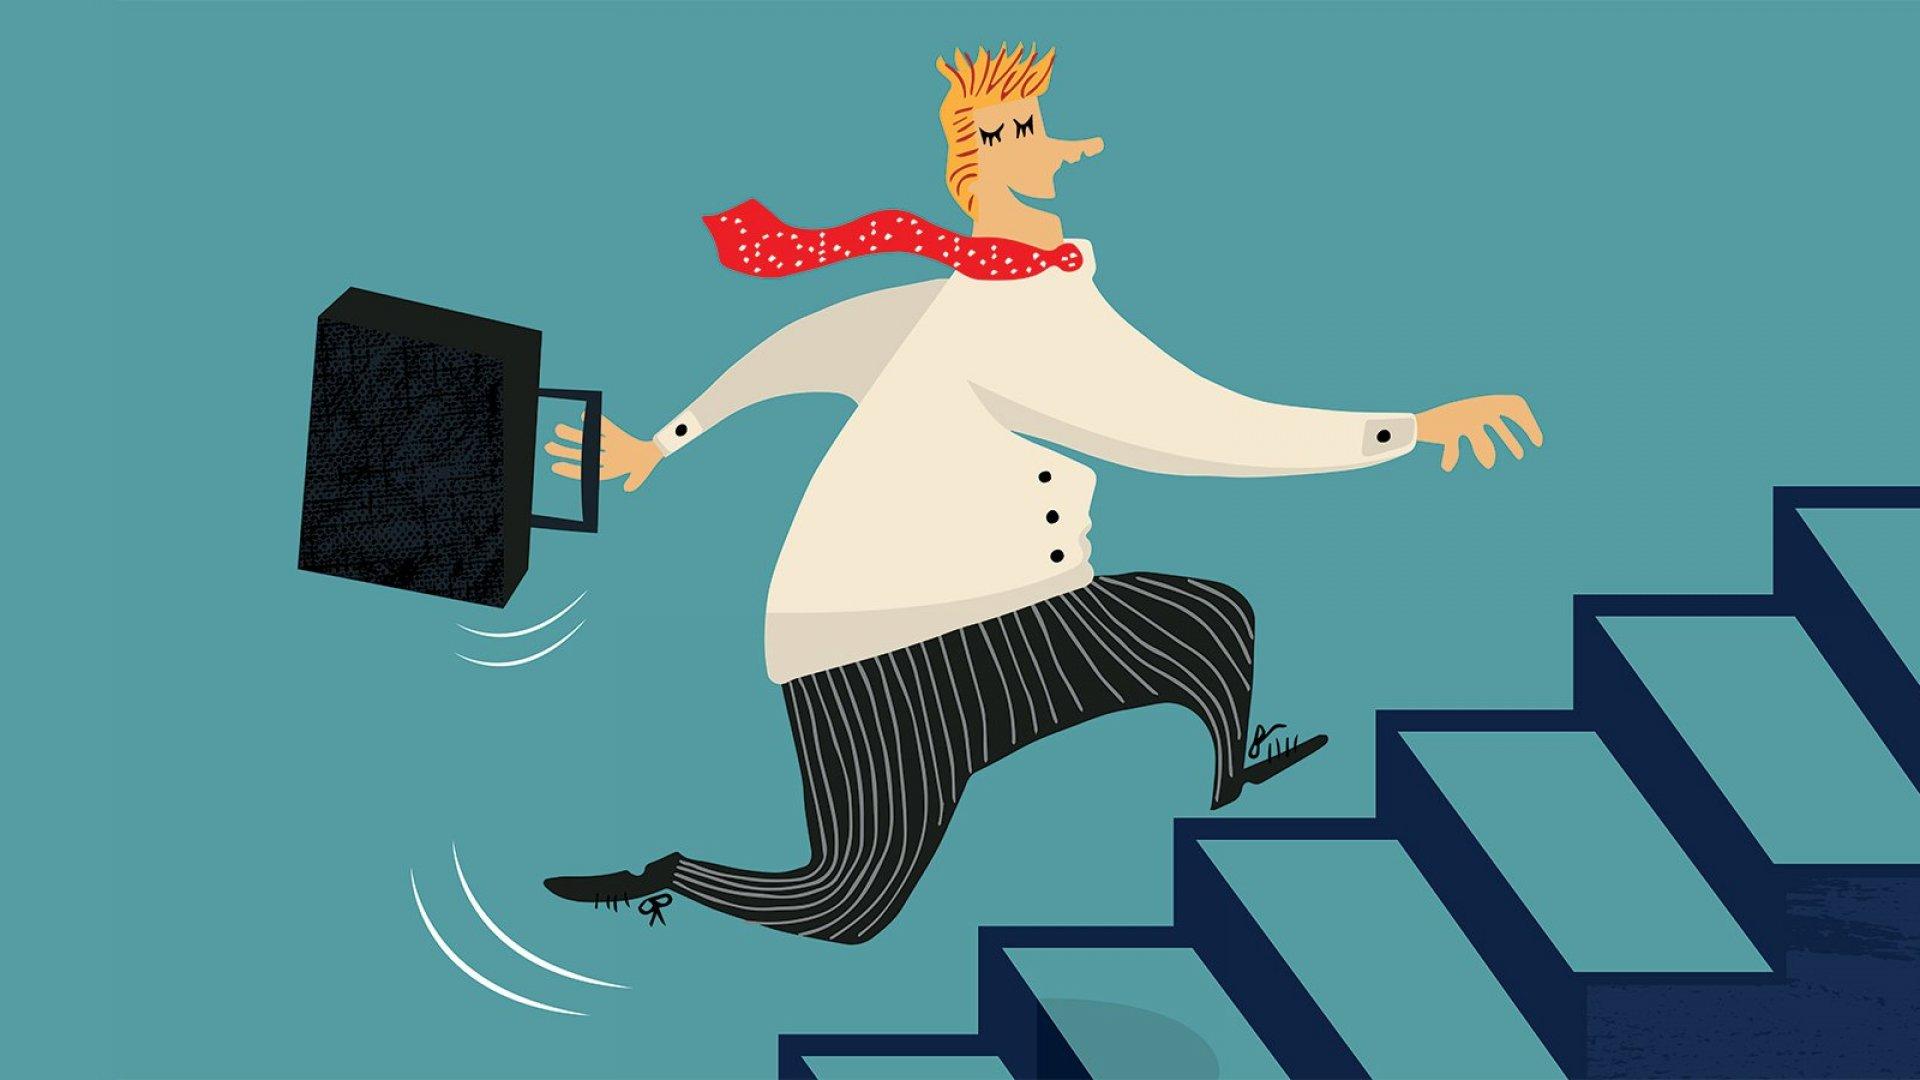 Business Owner Optimism Is Highest Since 2004